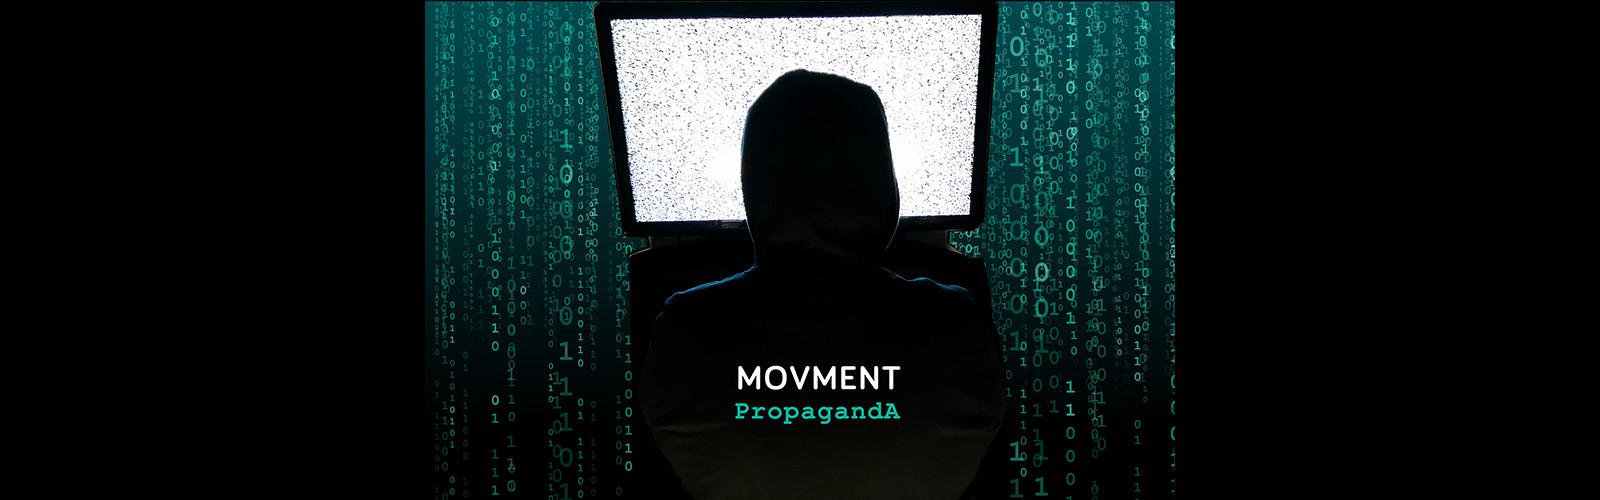 Movment-Propaganda-Single-Sleeve-16x5-01